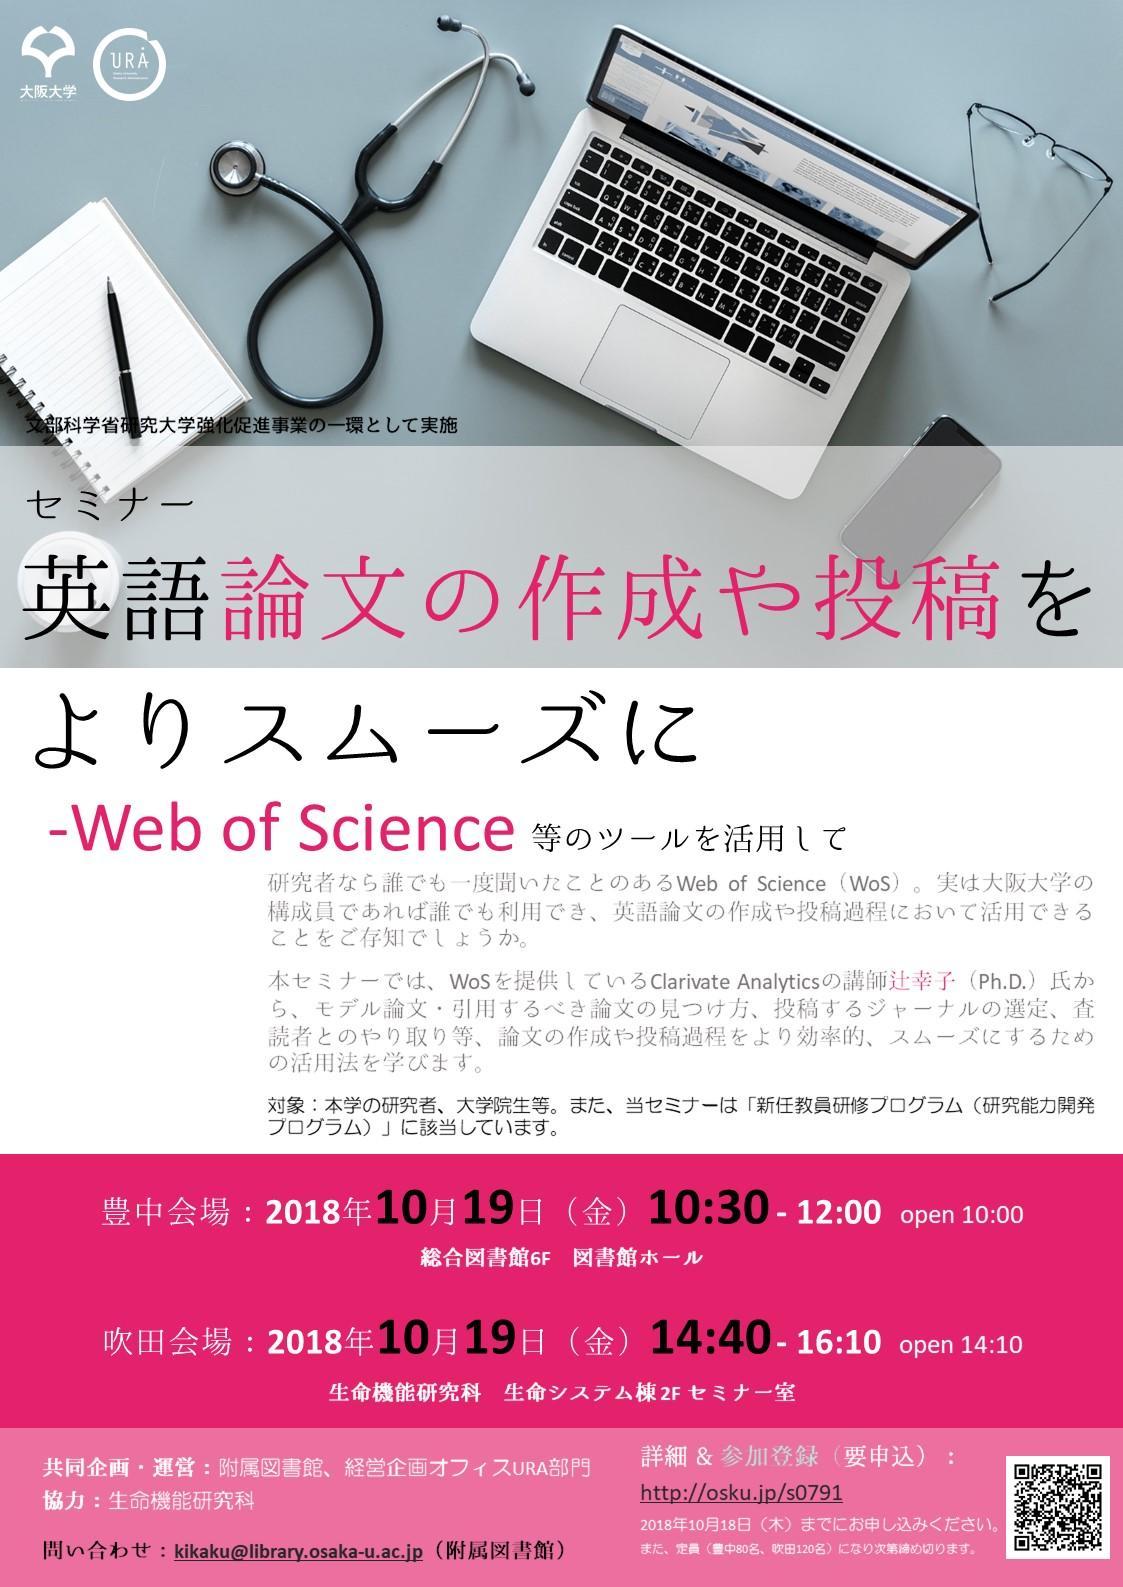 2018-10-19 Seminar.jpg